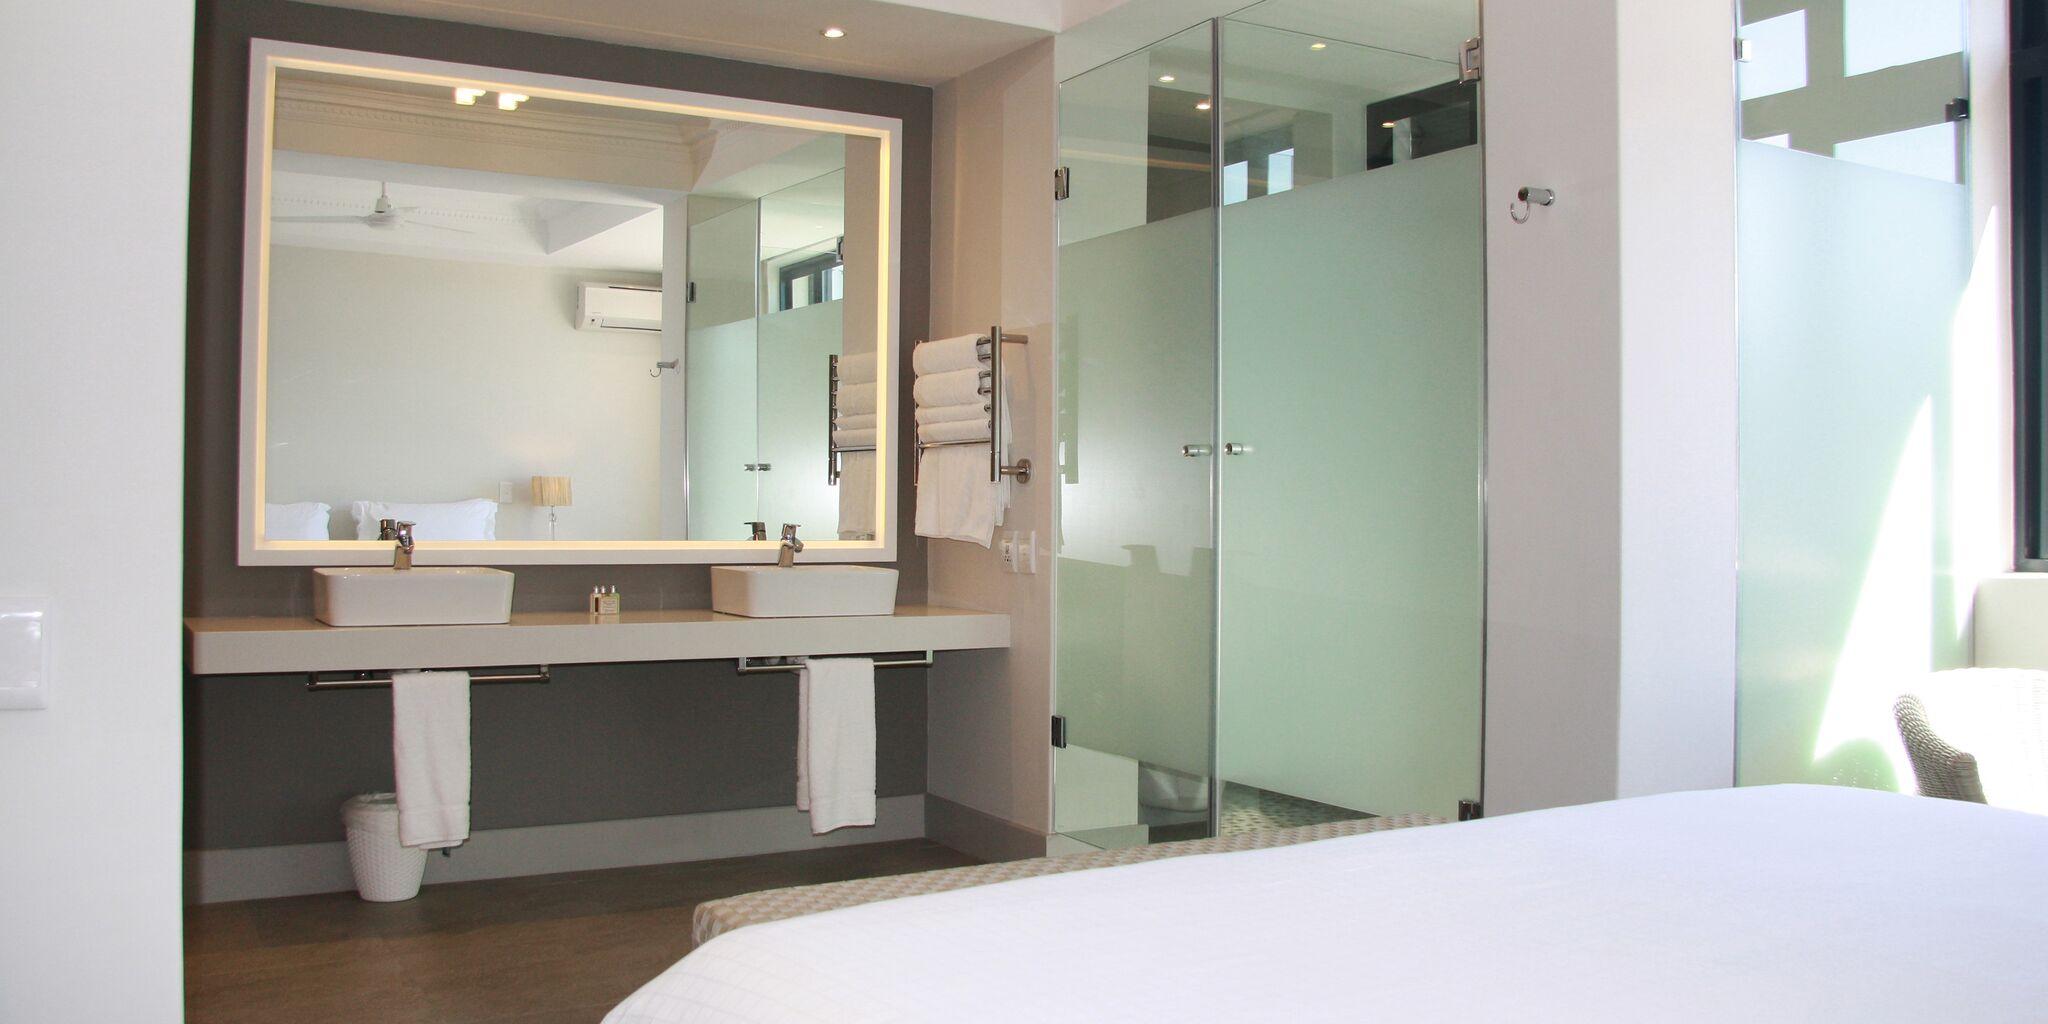 village square bathroom